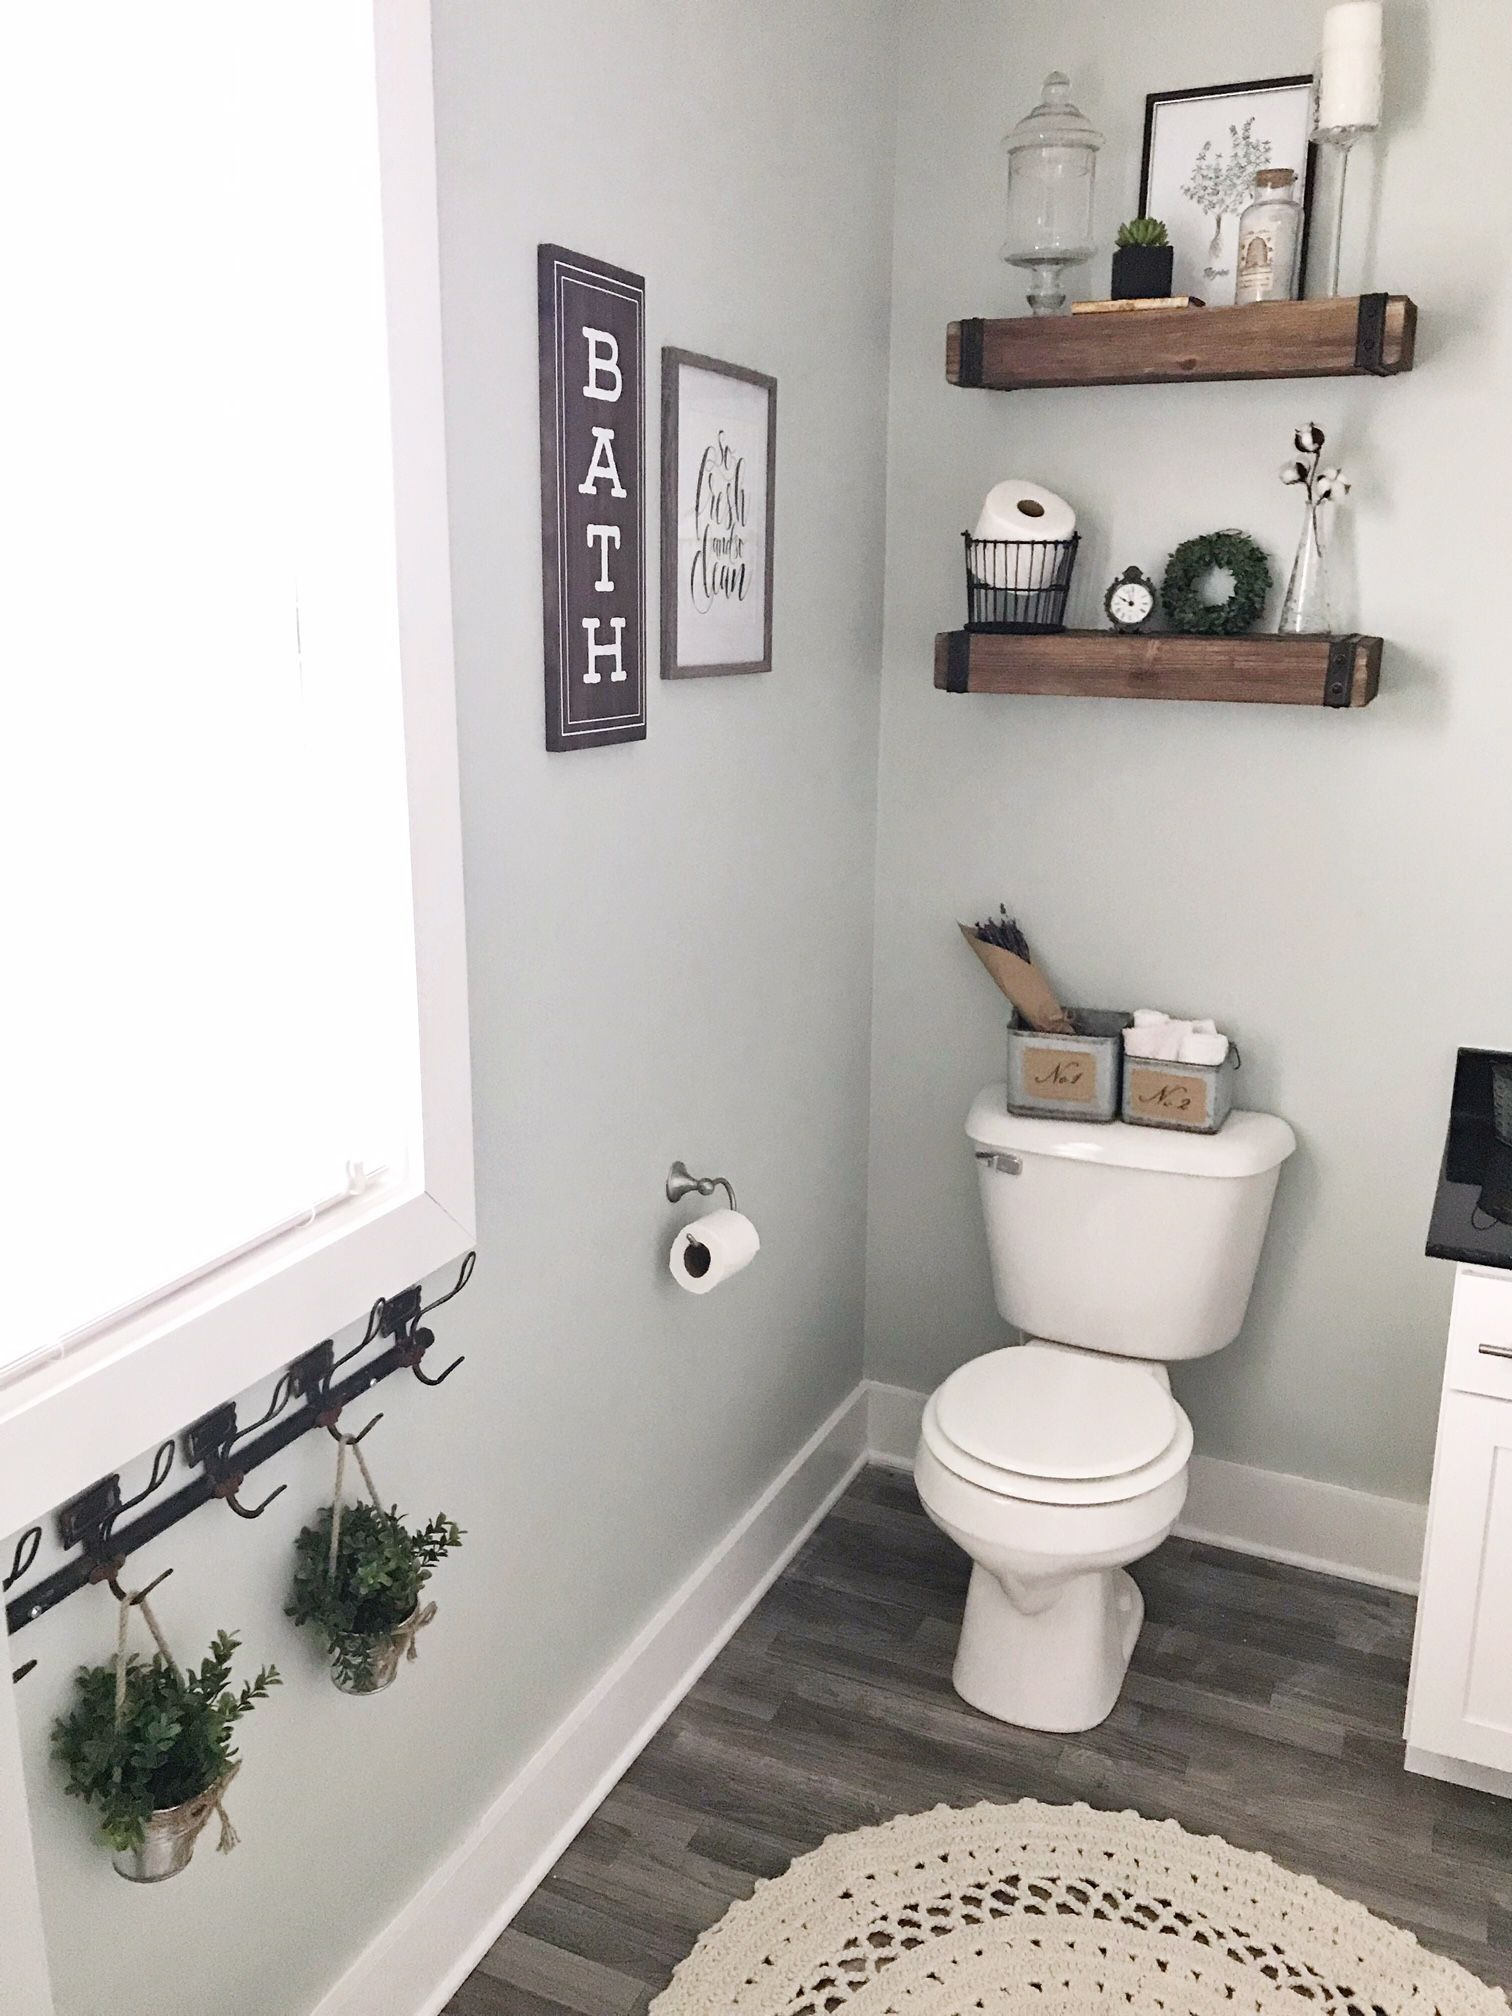 Wicker Basket Shabby Chic Ruffle Shower Curtain Modern Farmhouse Bathroom Sherwin Williams Sea Salt Clean Rustic Decor Cozy